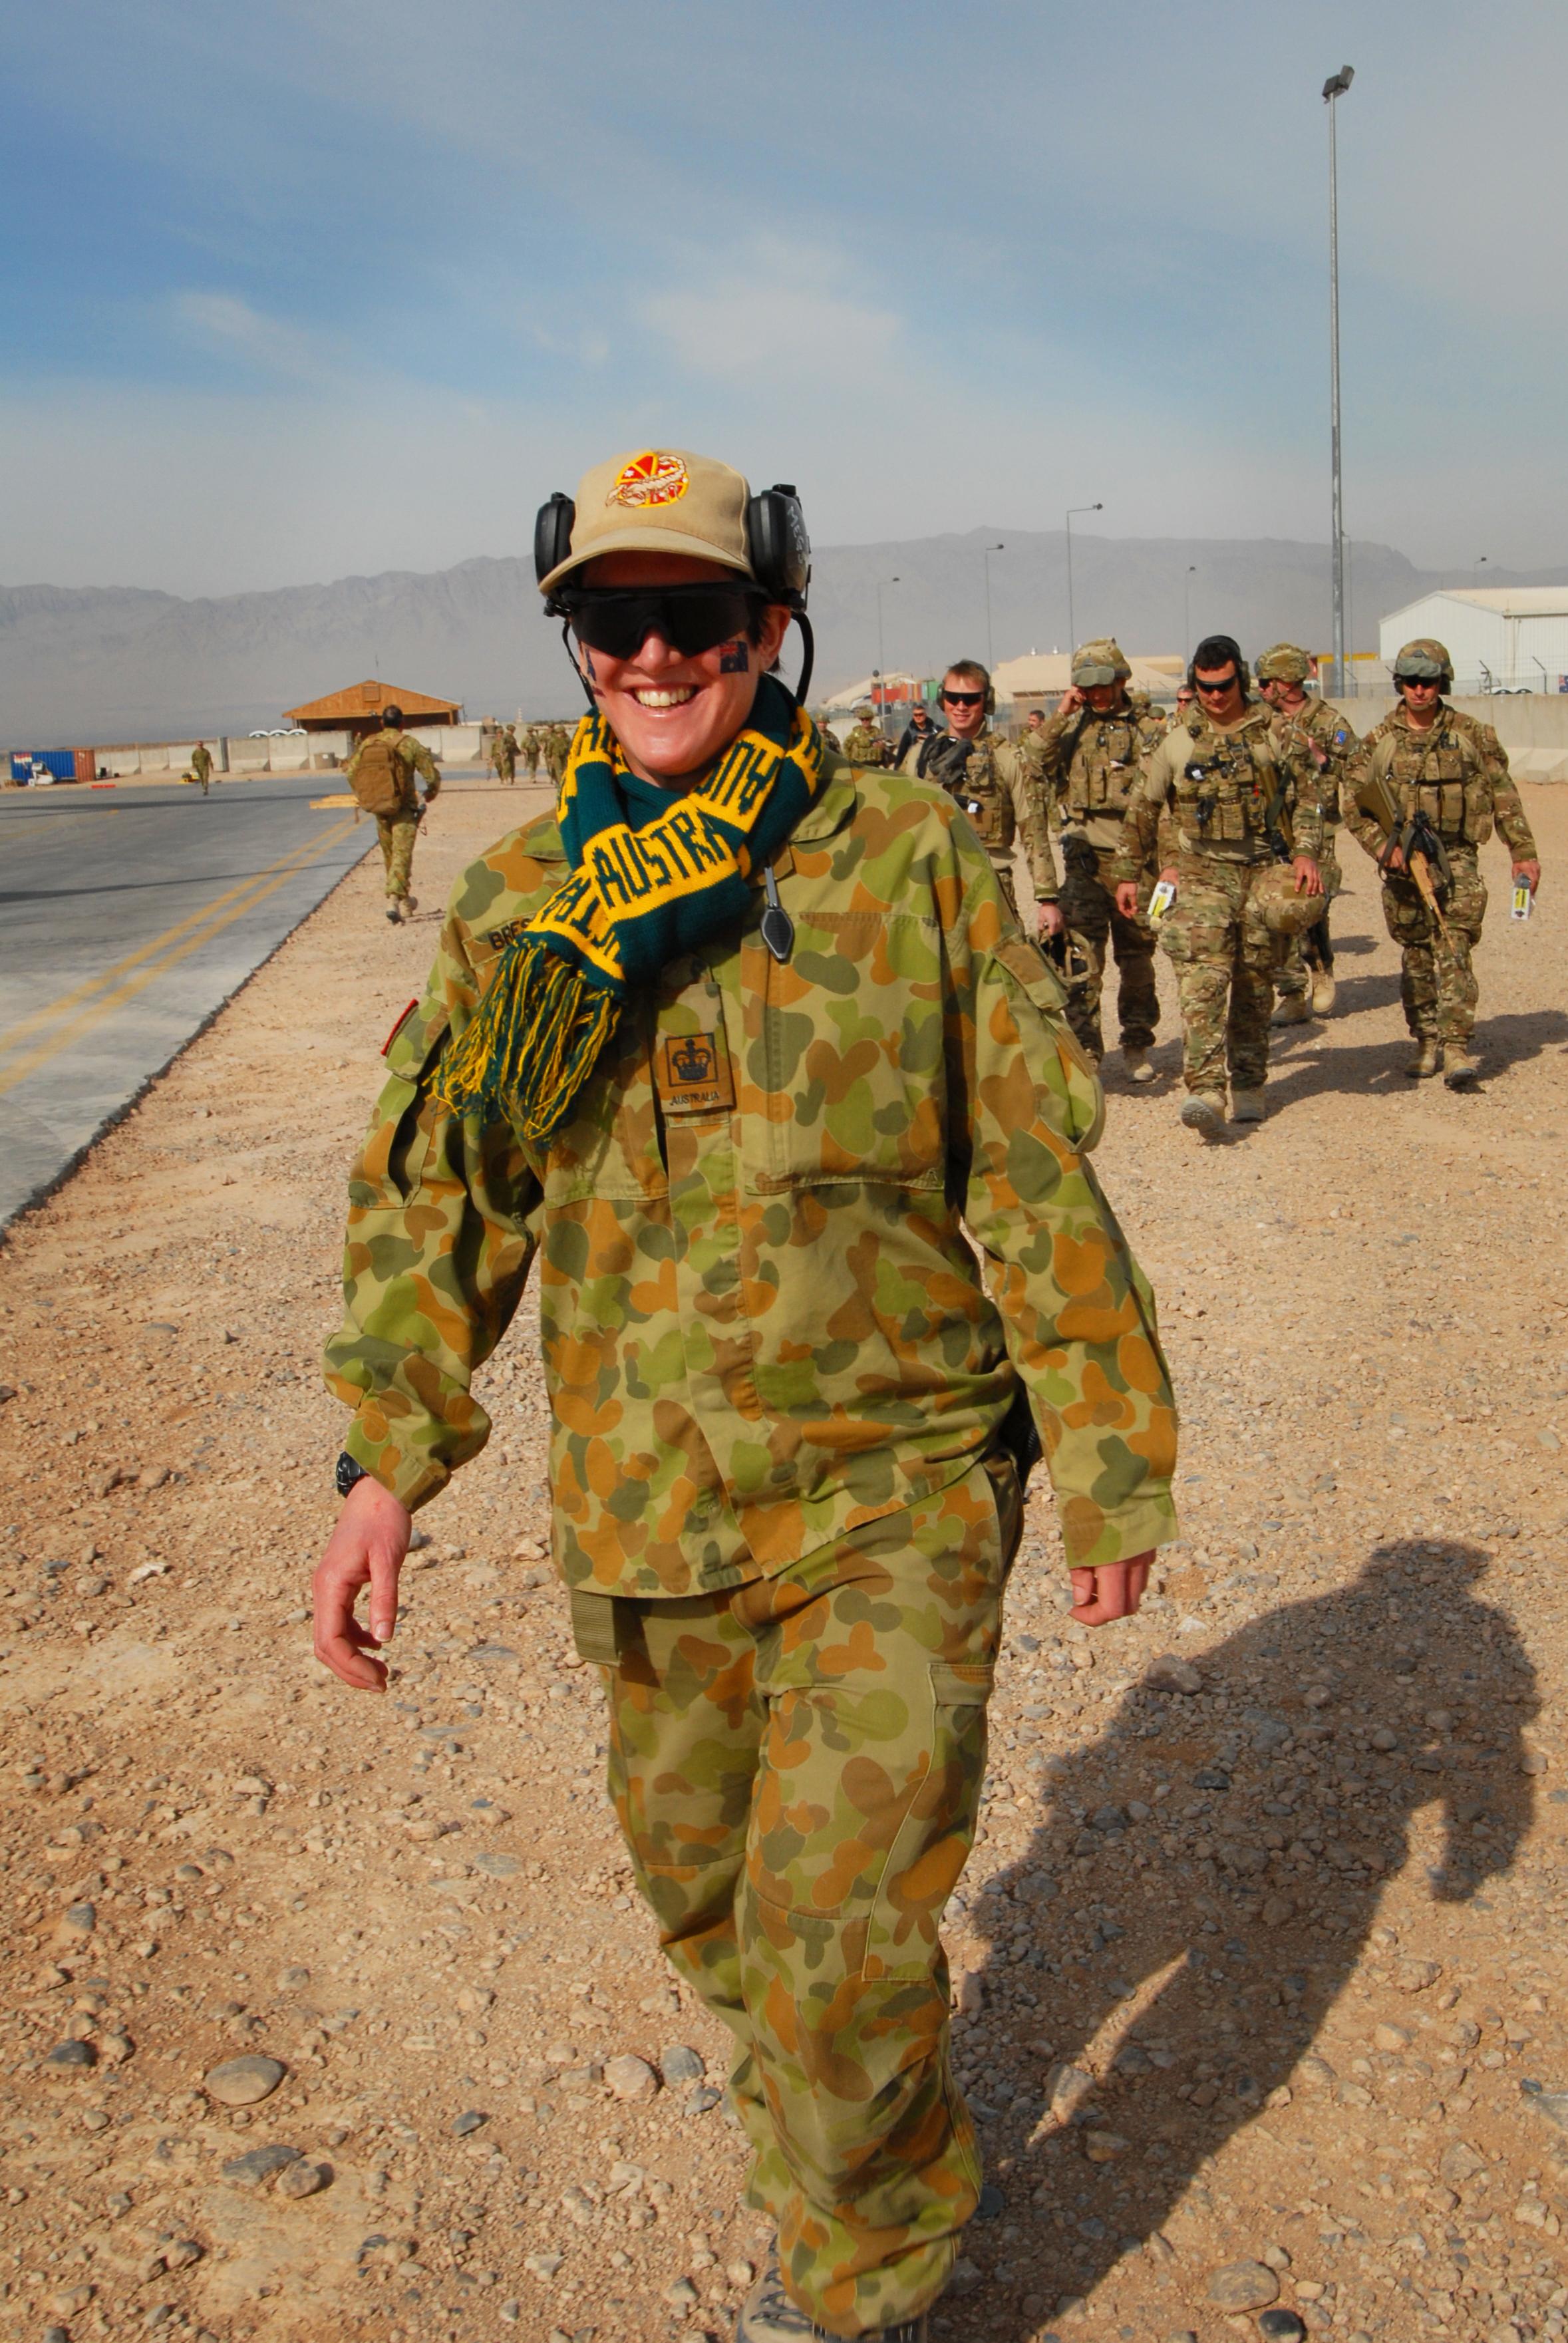 File:Australian WO2 celebrating Australia Day 2013 in Afghanistan